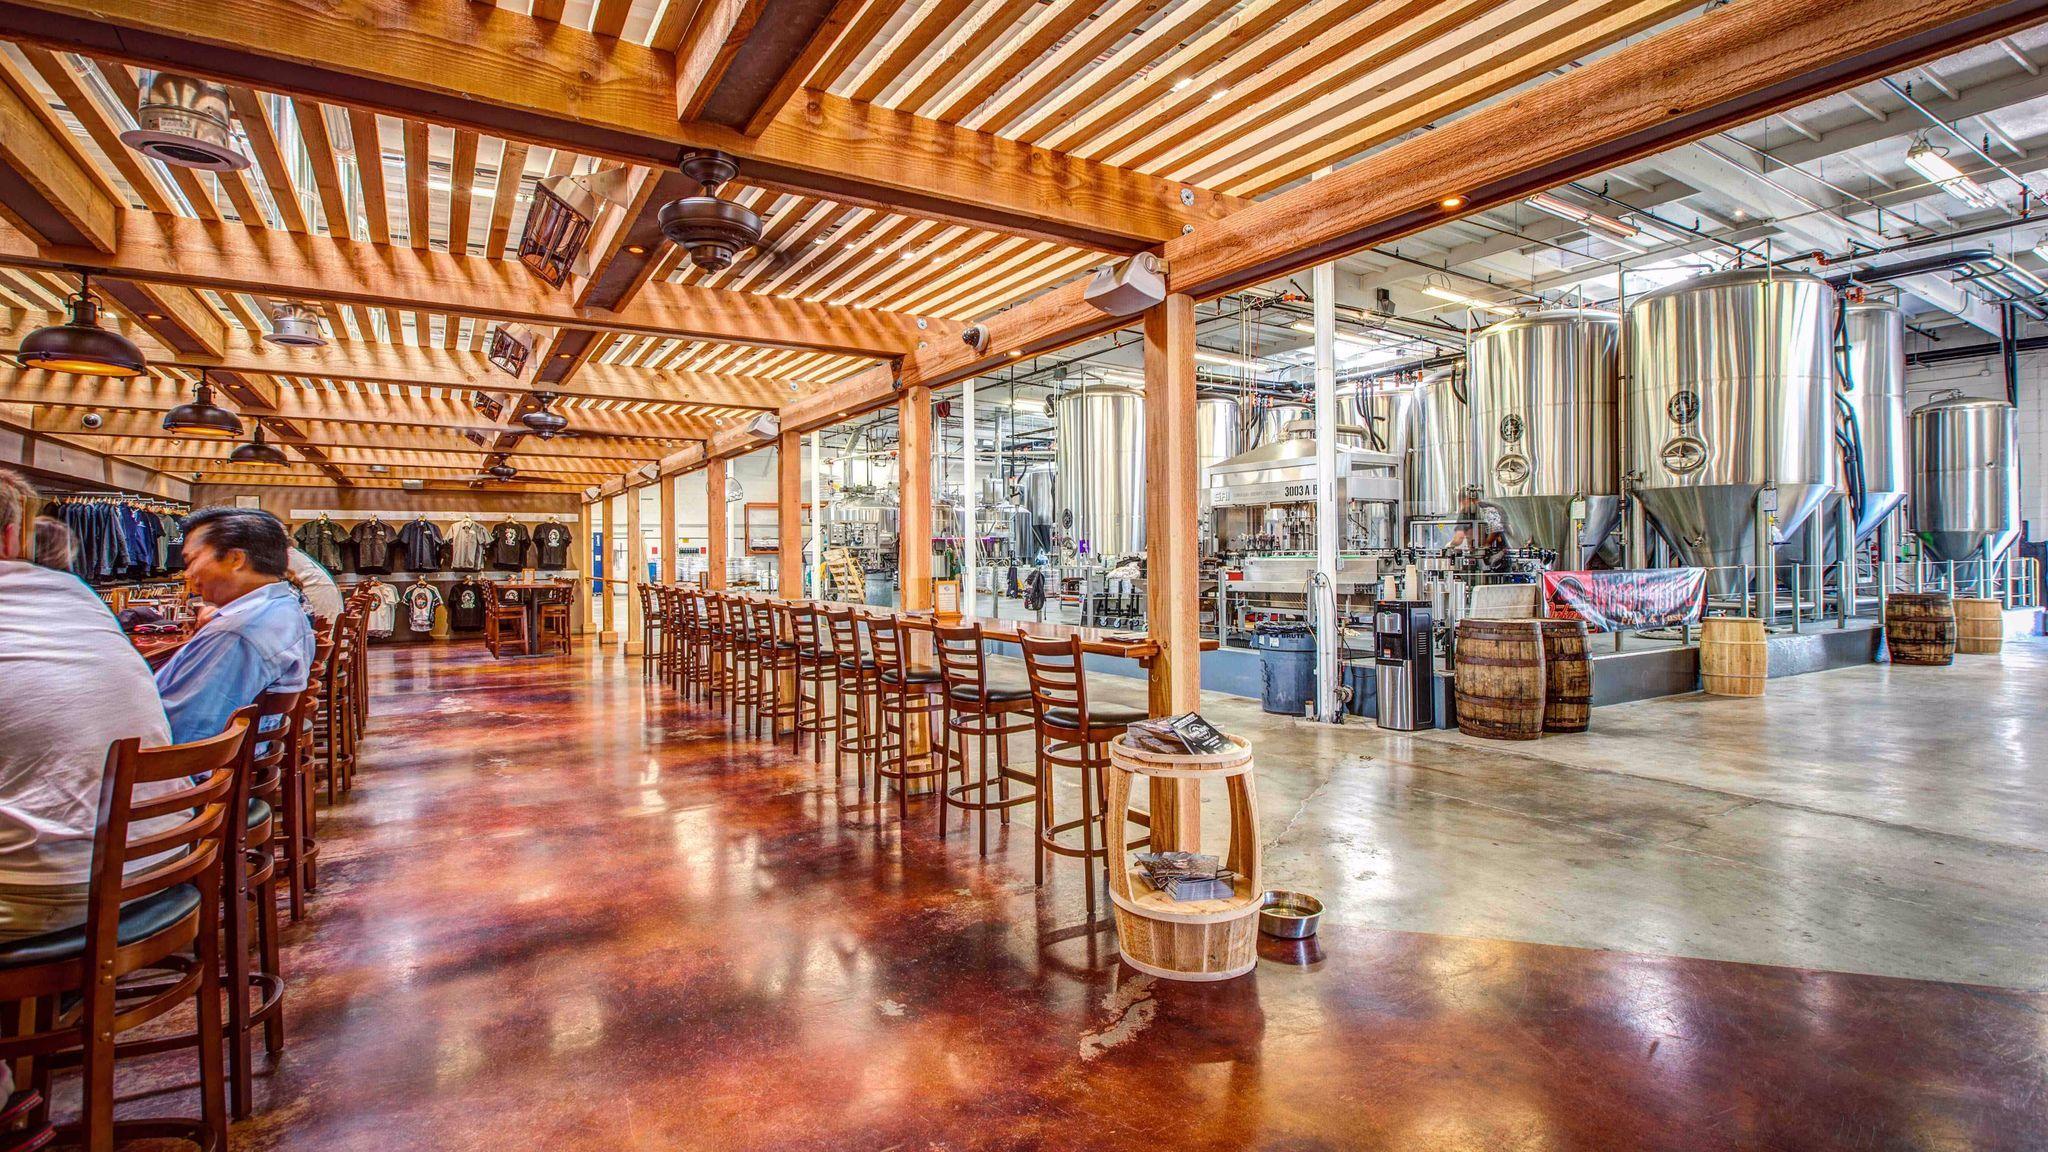 Tasting room and production at Coronado Brewing Co.